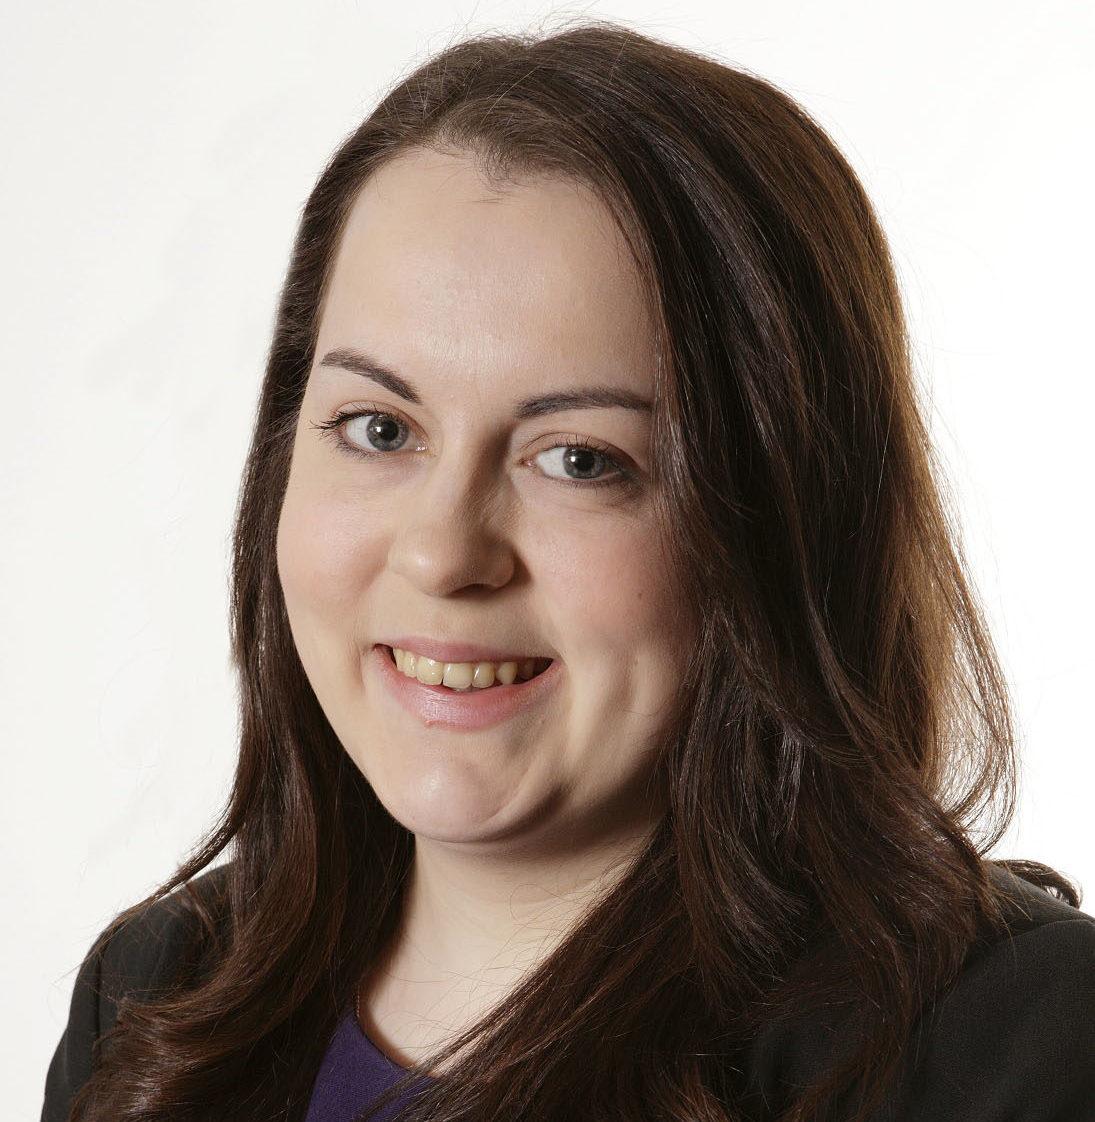 Victoria Handley-Garland